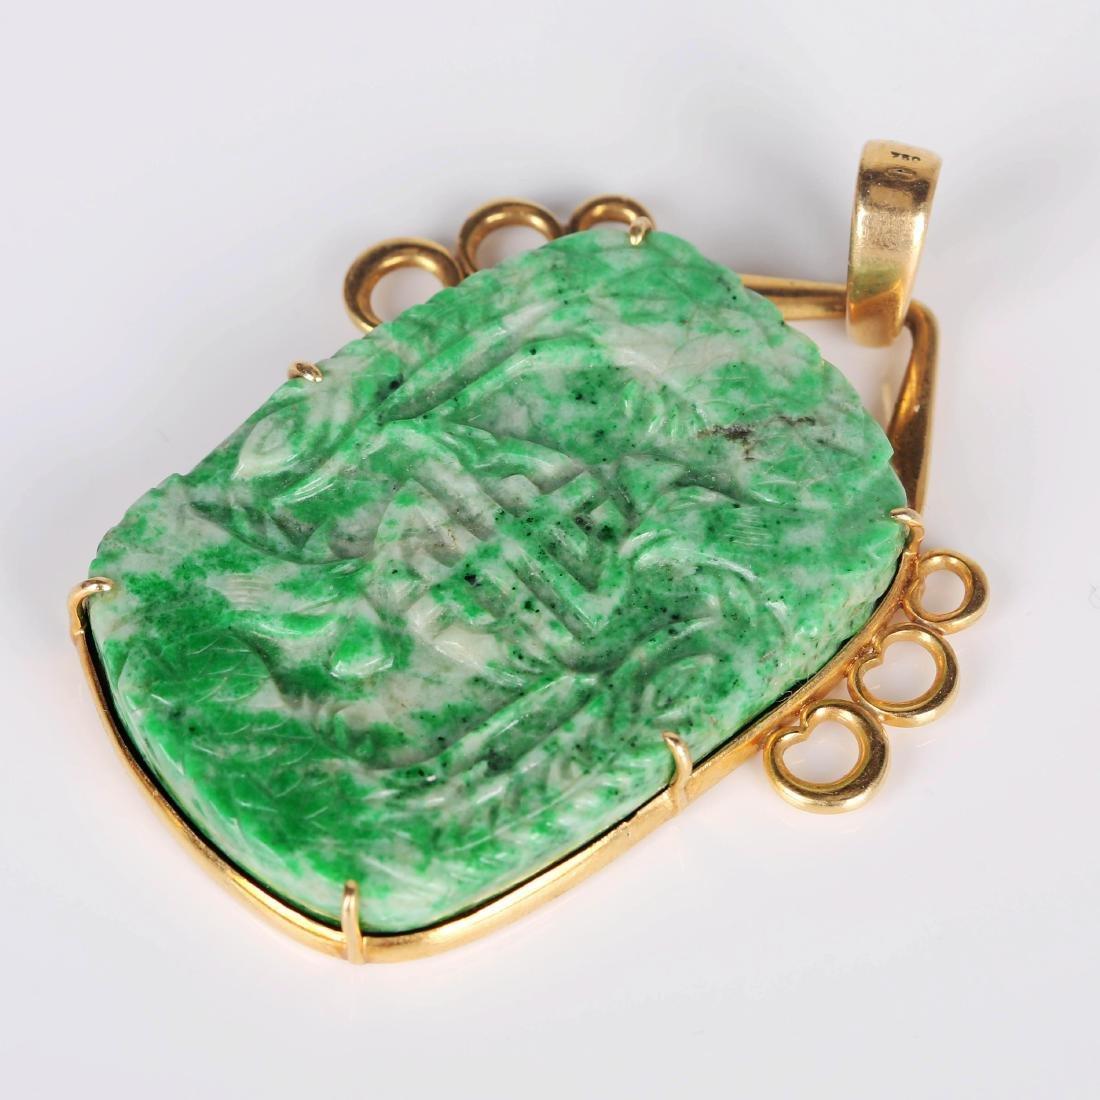 Chinese emerald pendant